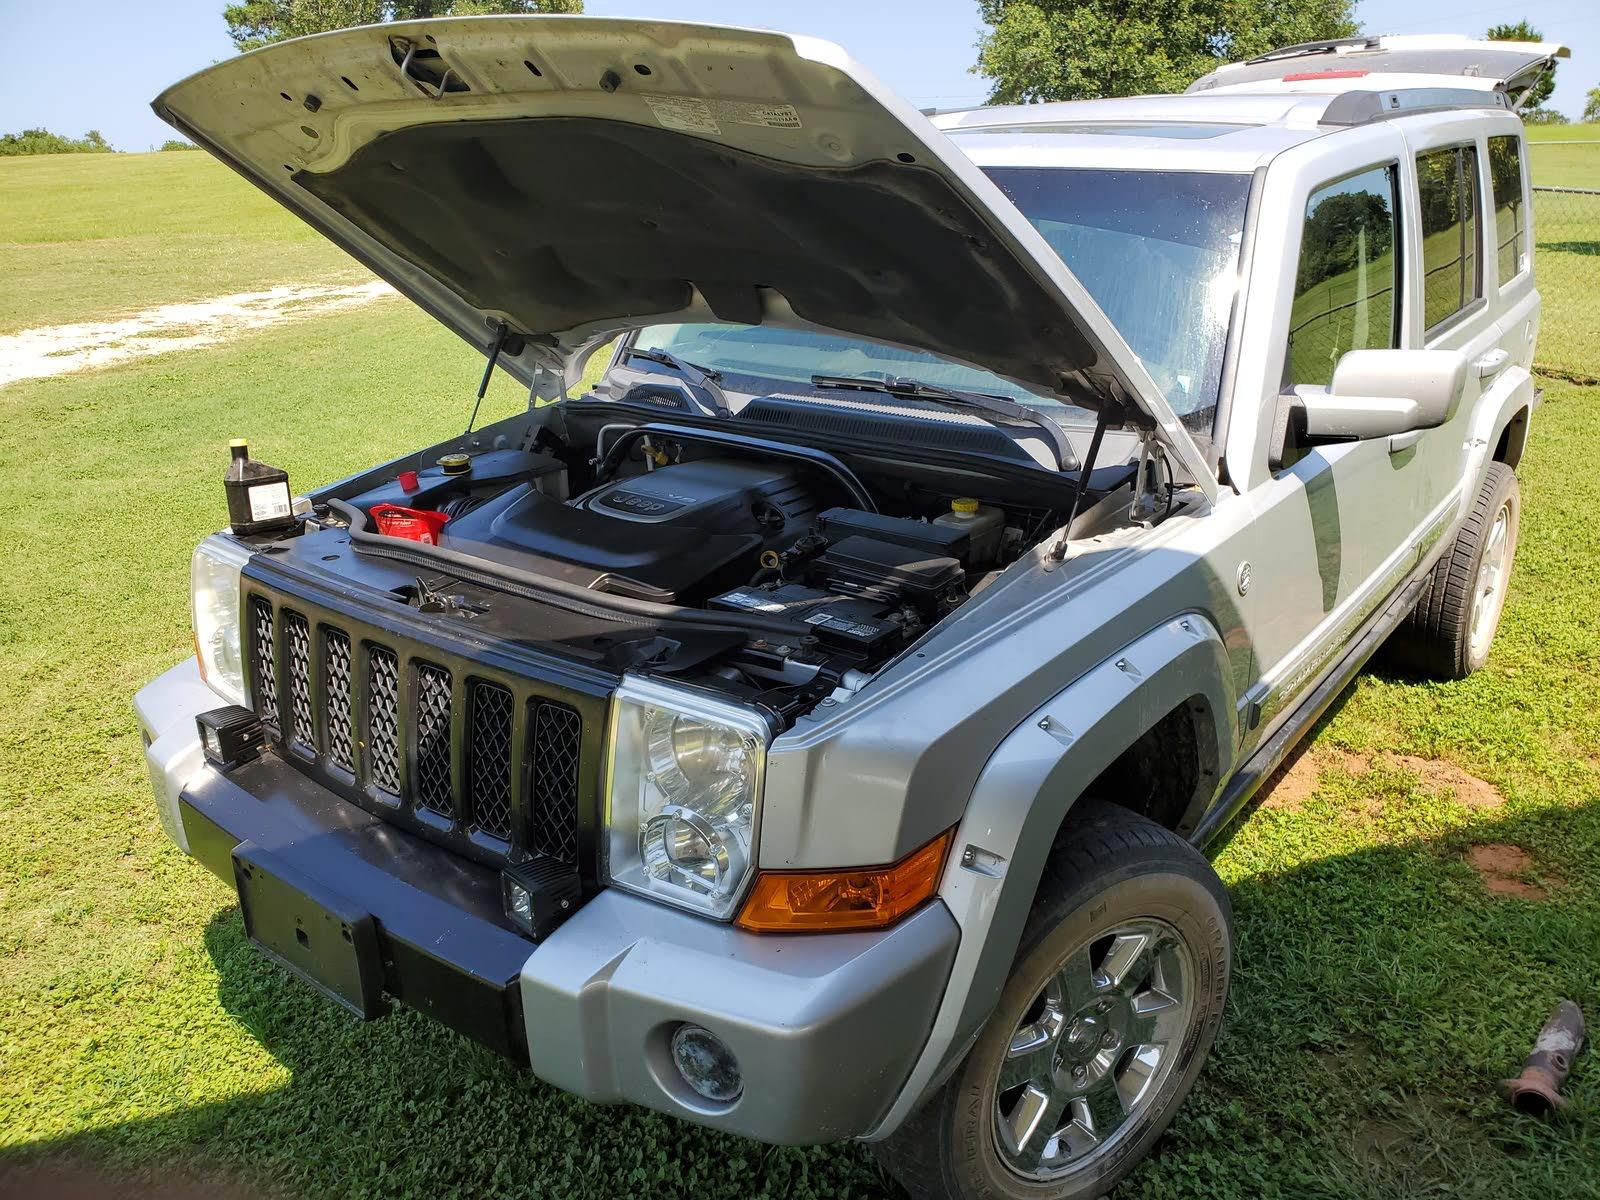 [DIAGRAM_5NL]  Jeep Commander Questions - Jeep commander overlander 5.7 hemi wont start  just click - CarGurus   2007 Jeep Commander Starter Wiring      CarGurus